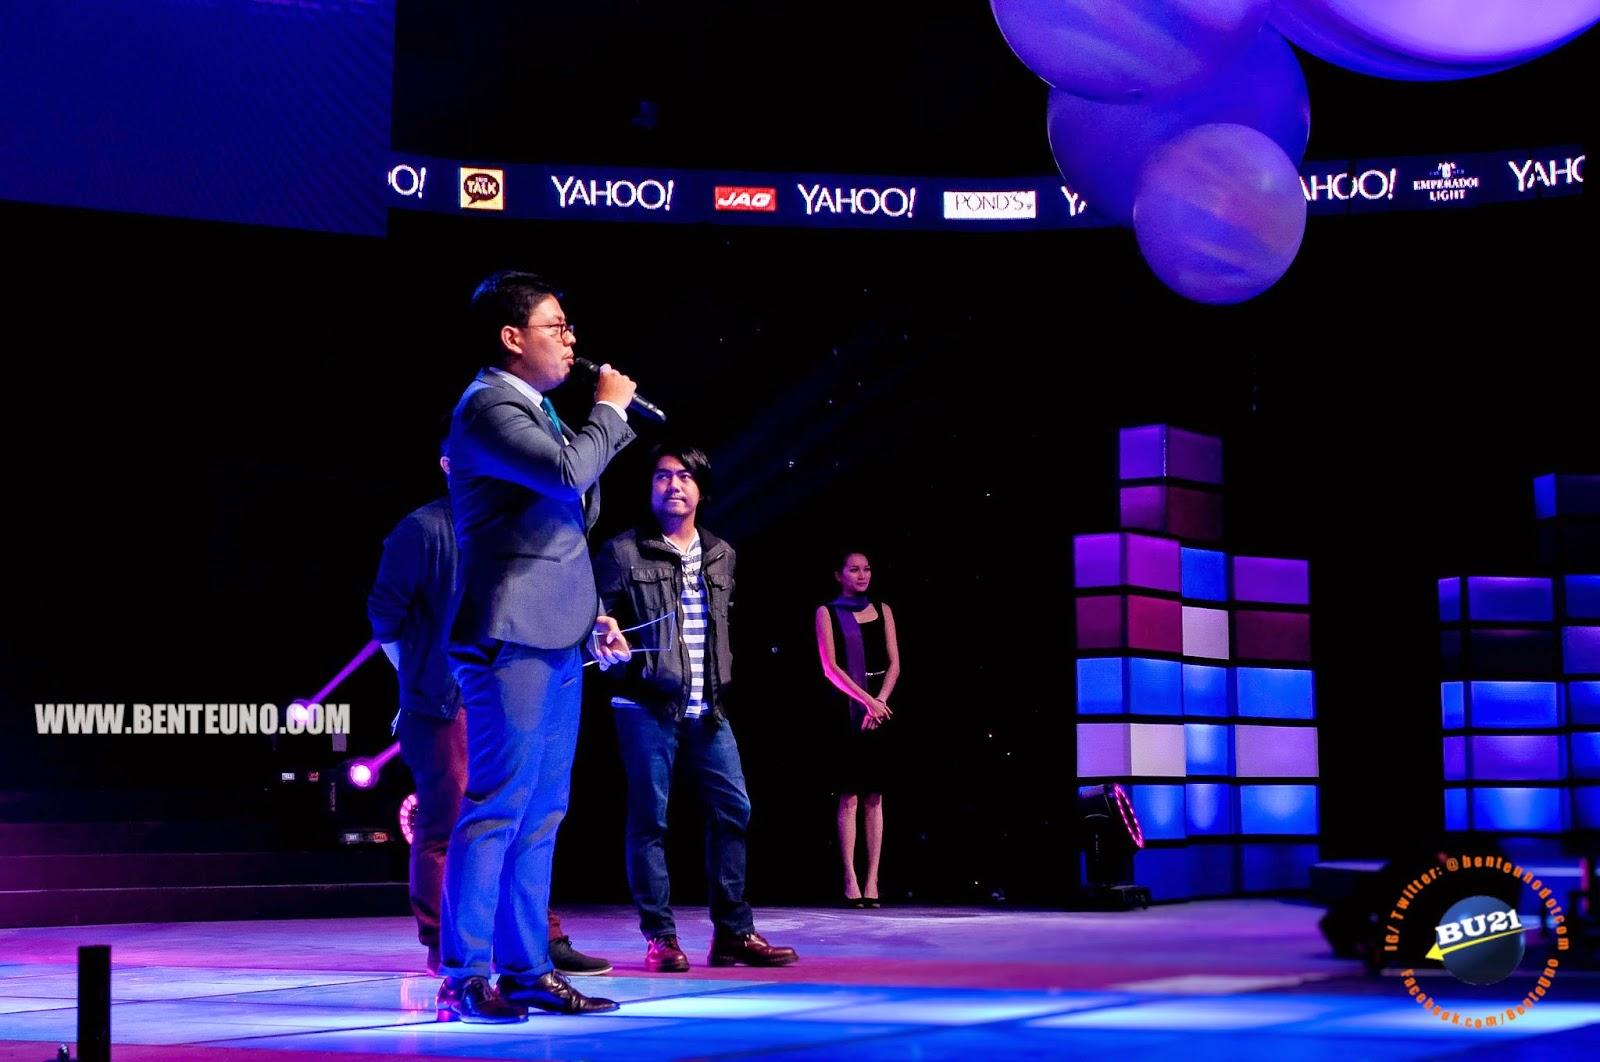 Yolanda Moon is Emerging Band of the Year at Yahoo Celebrity Awards 2014